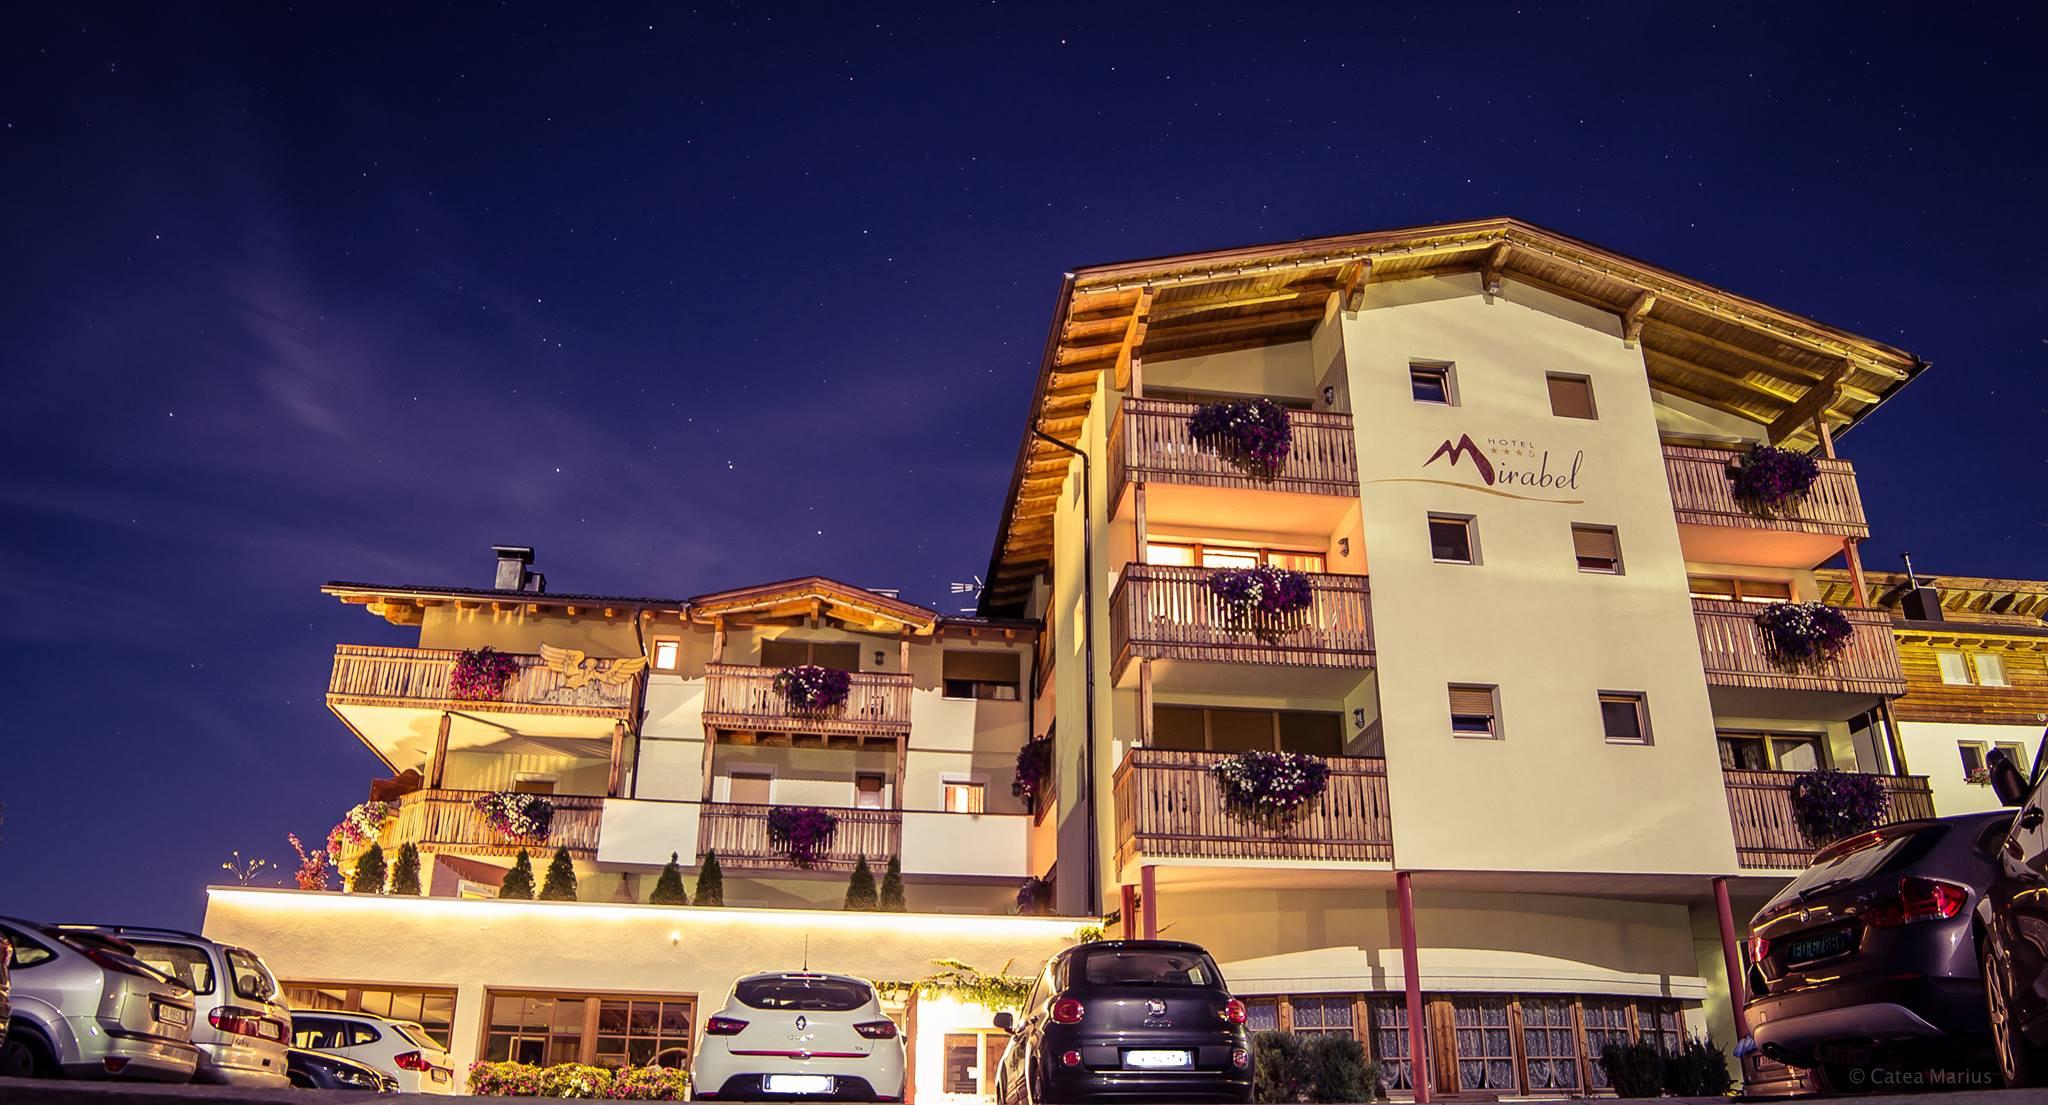 Hotel mirabel hotel per bambini in montagna in trentino for Hotel per bambini trentino